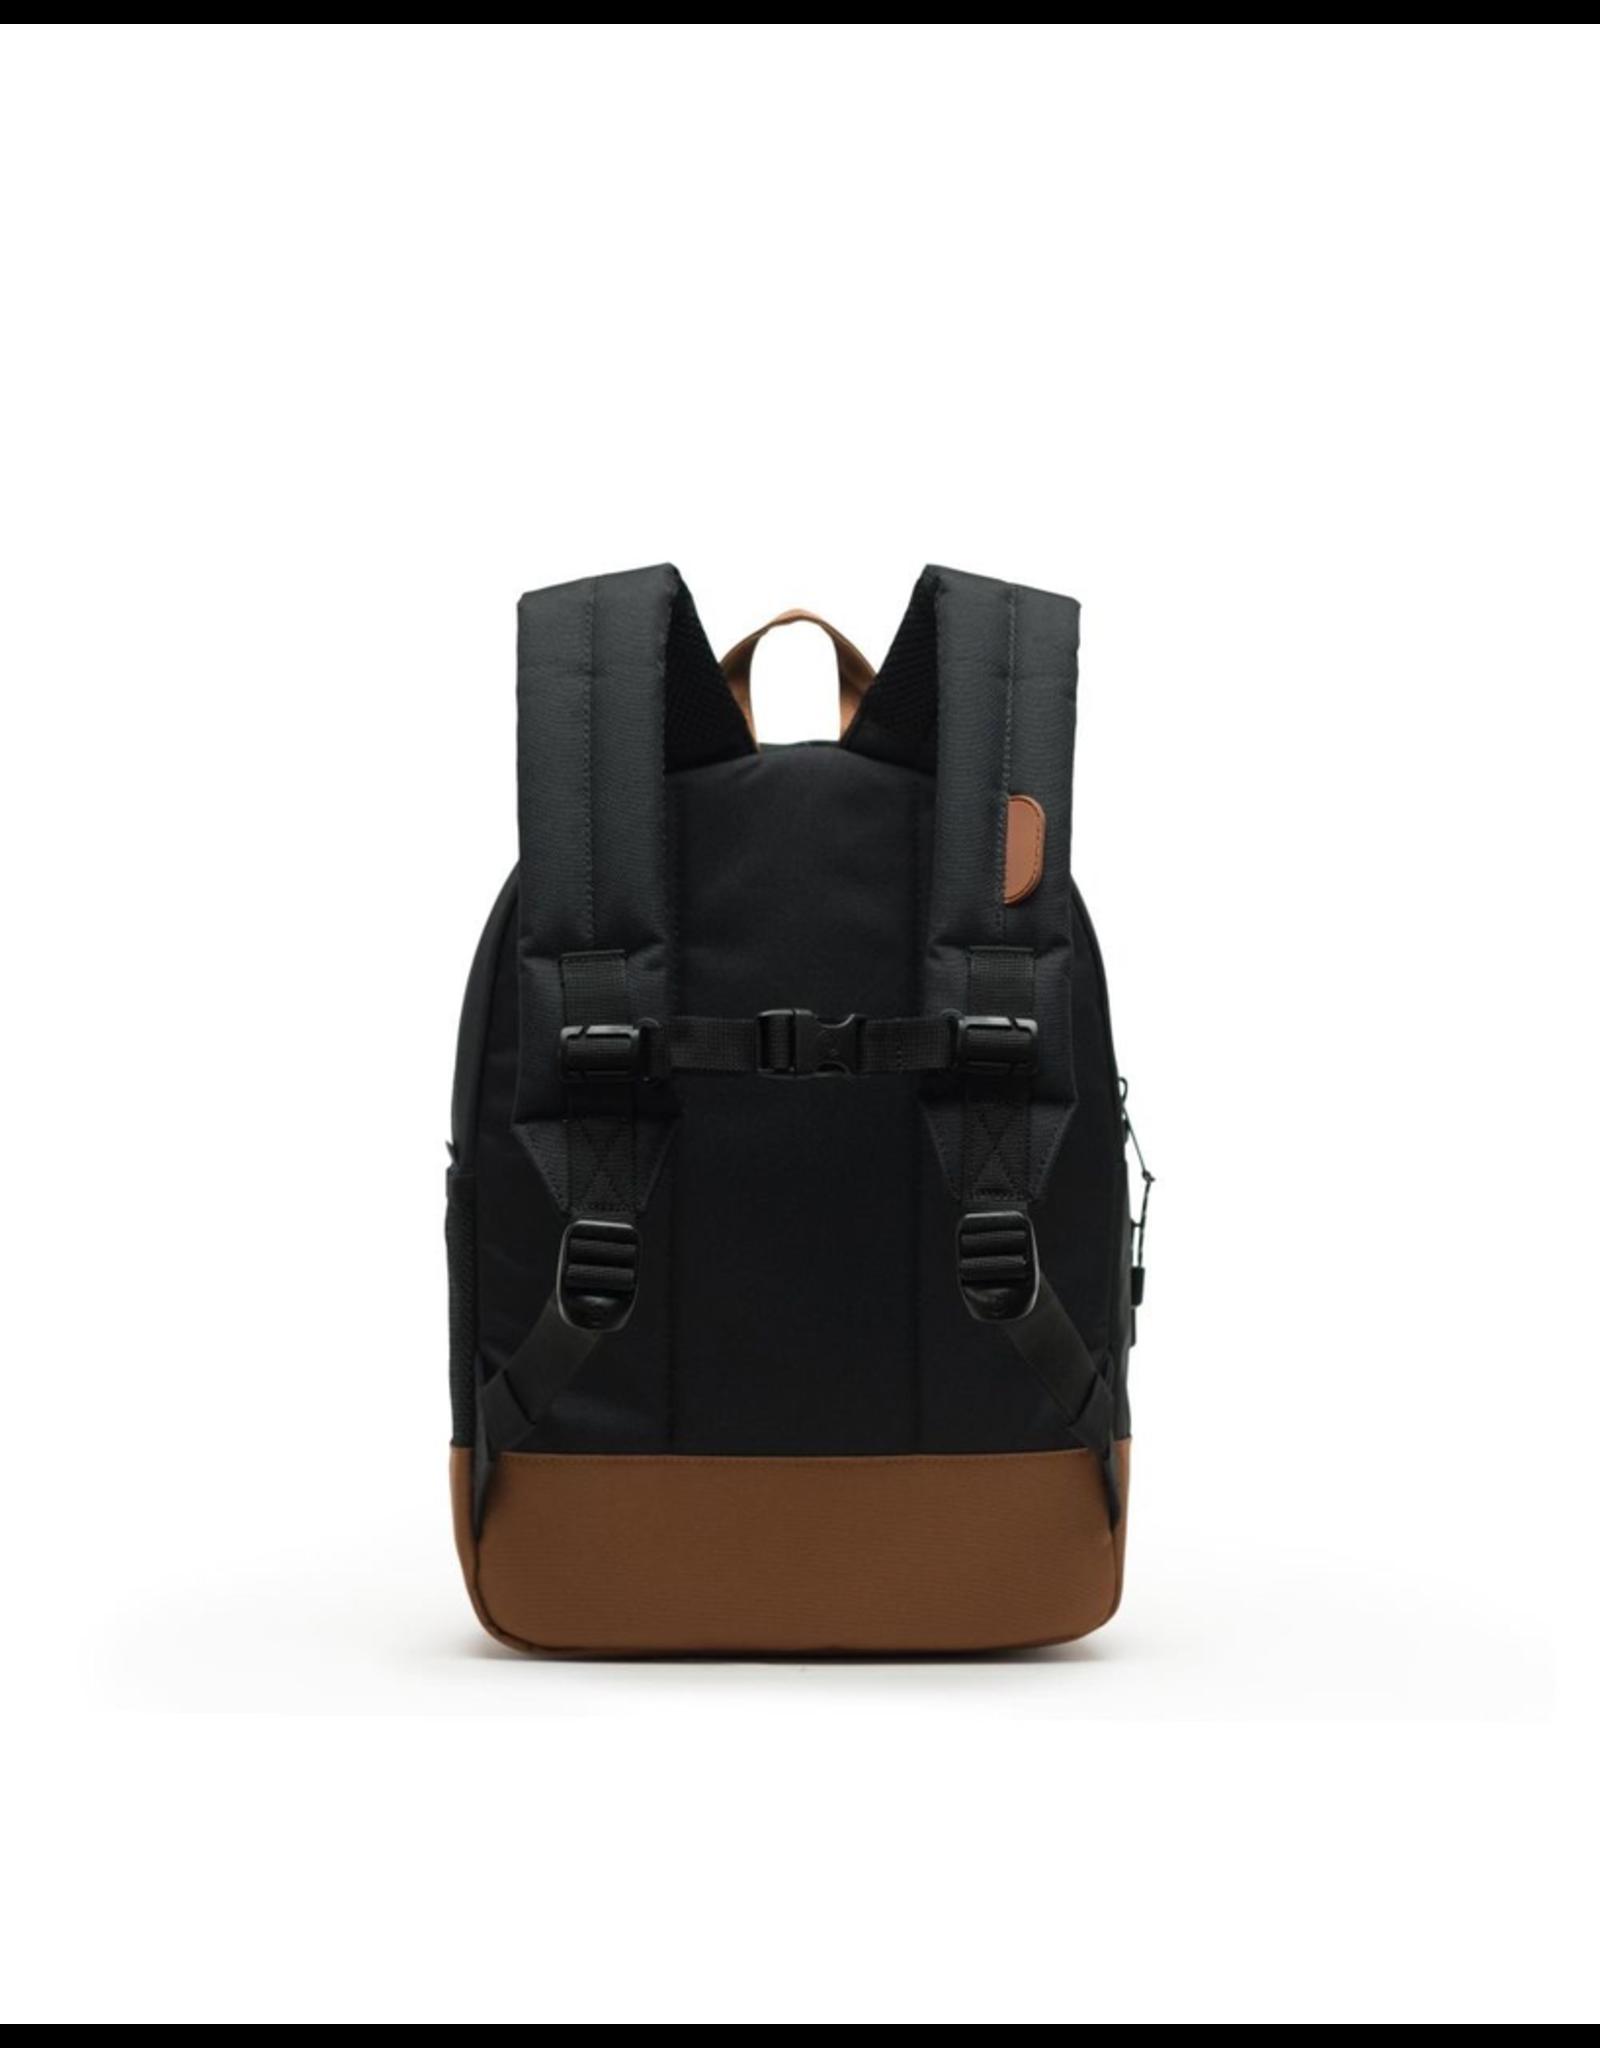 Herschel Heritage Backpack (Youth)